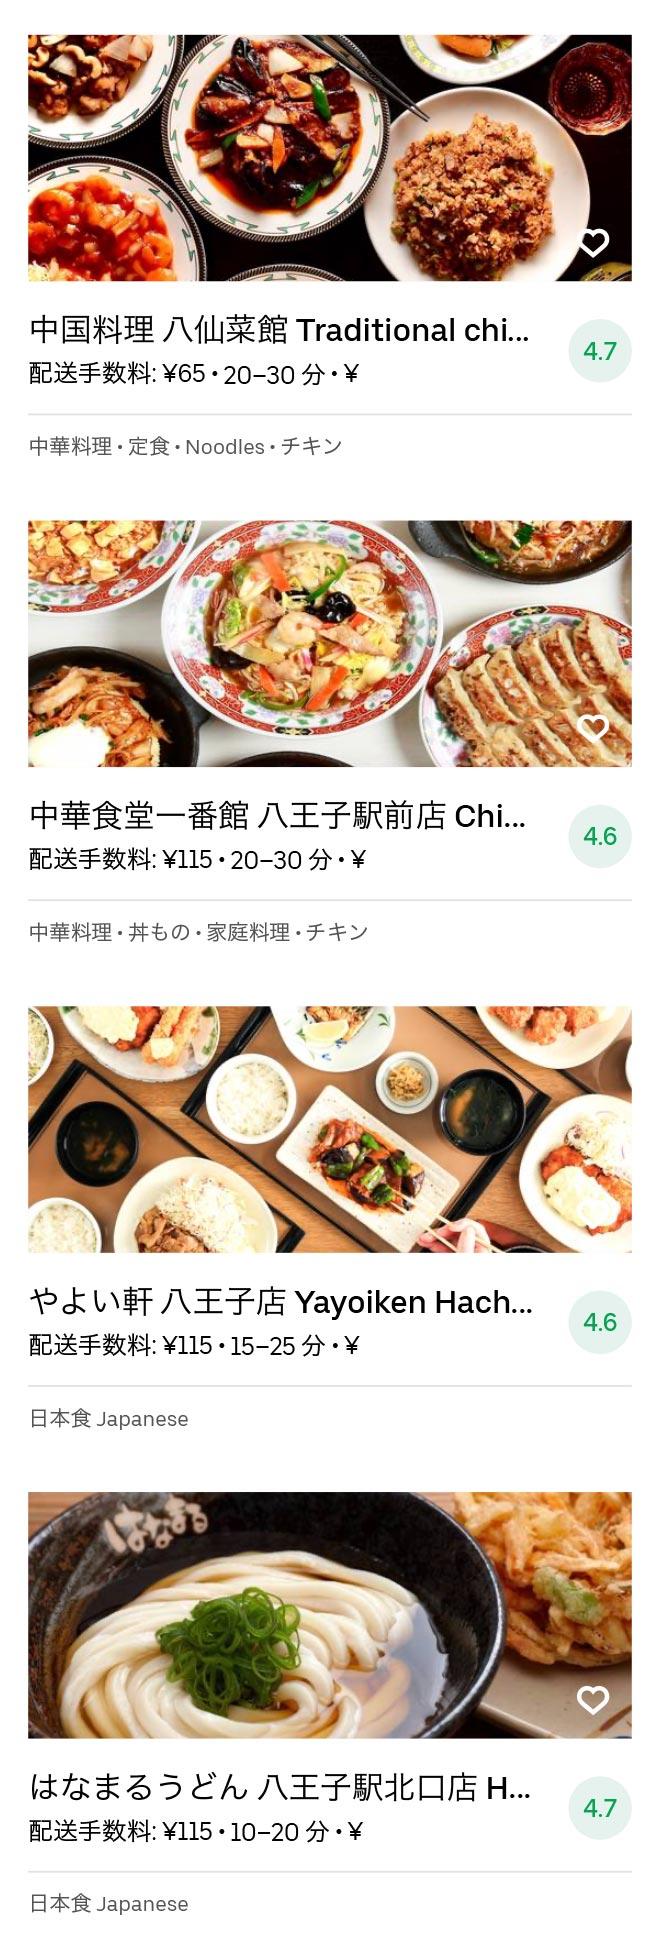 Hatioji menu 2010 05